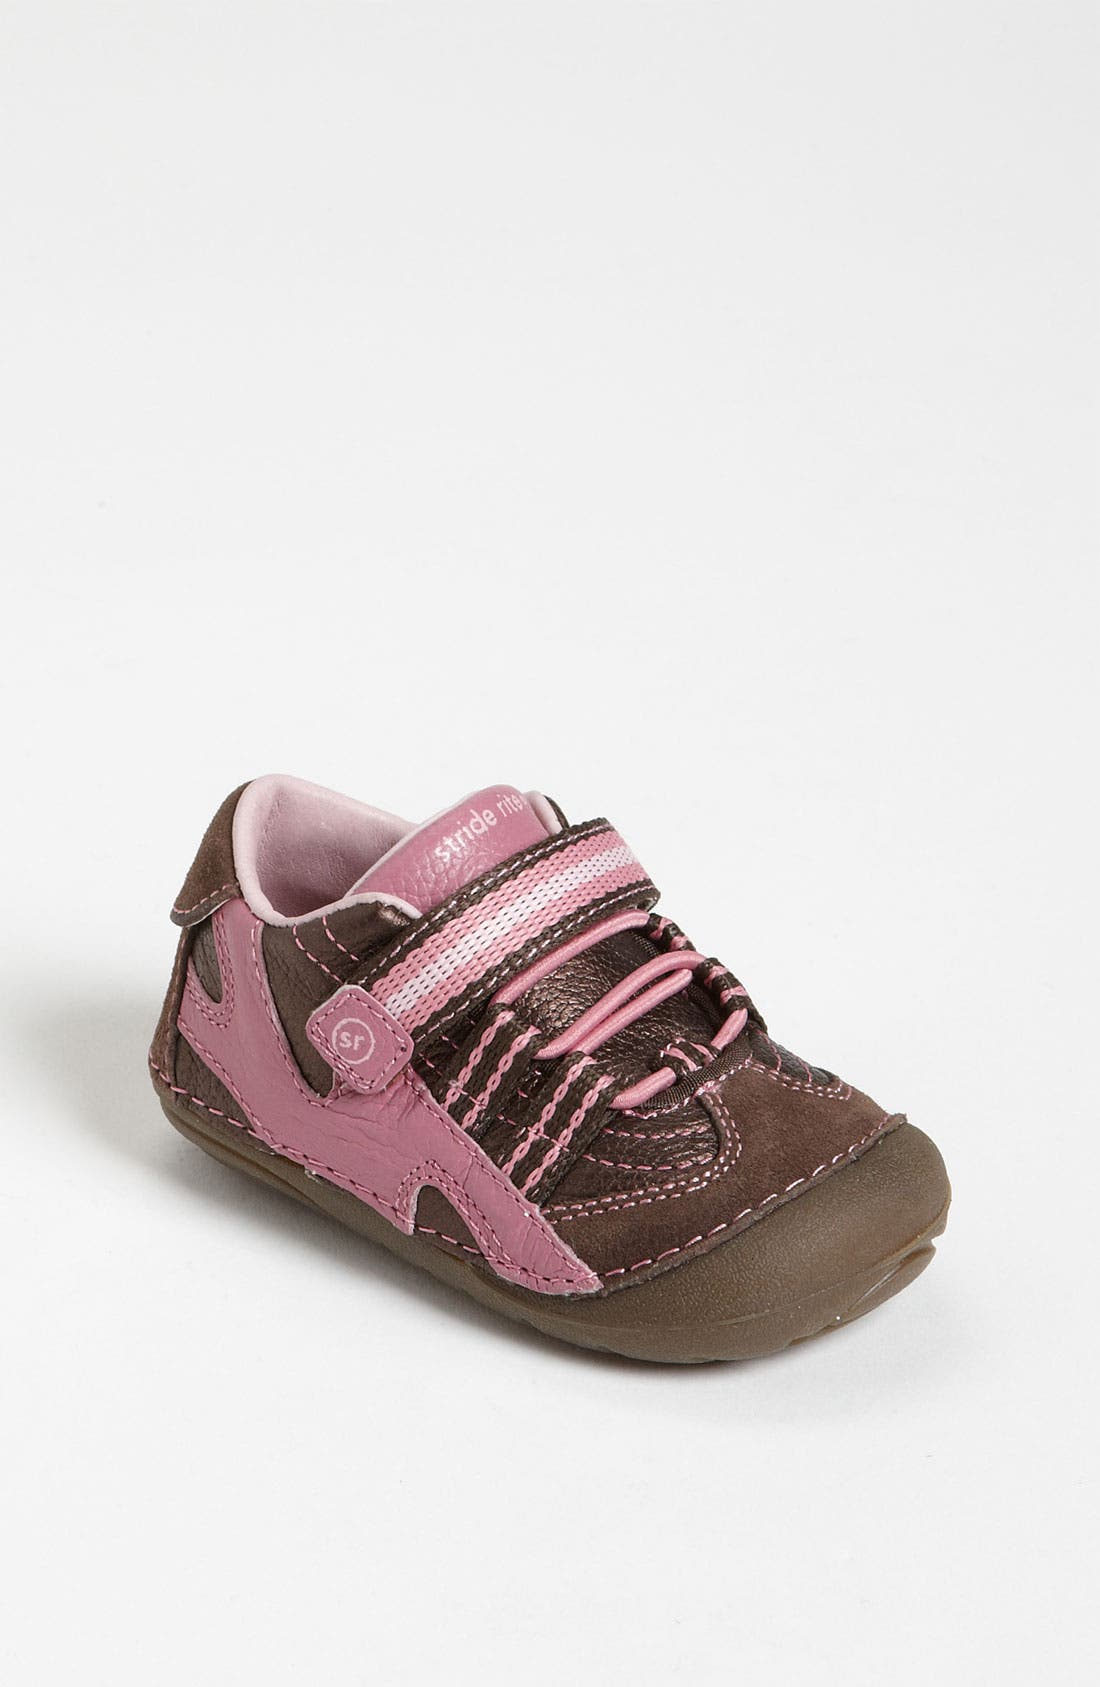 Main Image - Stride Rite 'Stephanie' Sneaker (Baby & Walker)